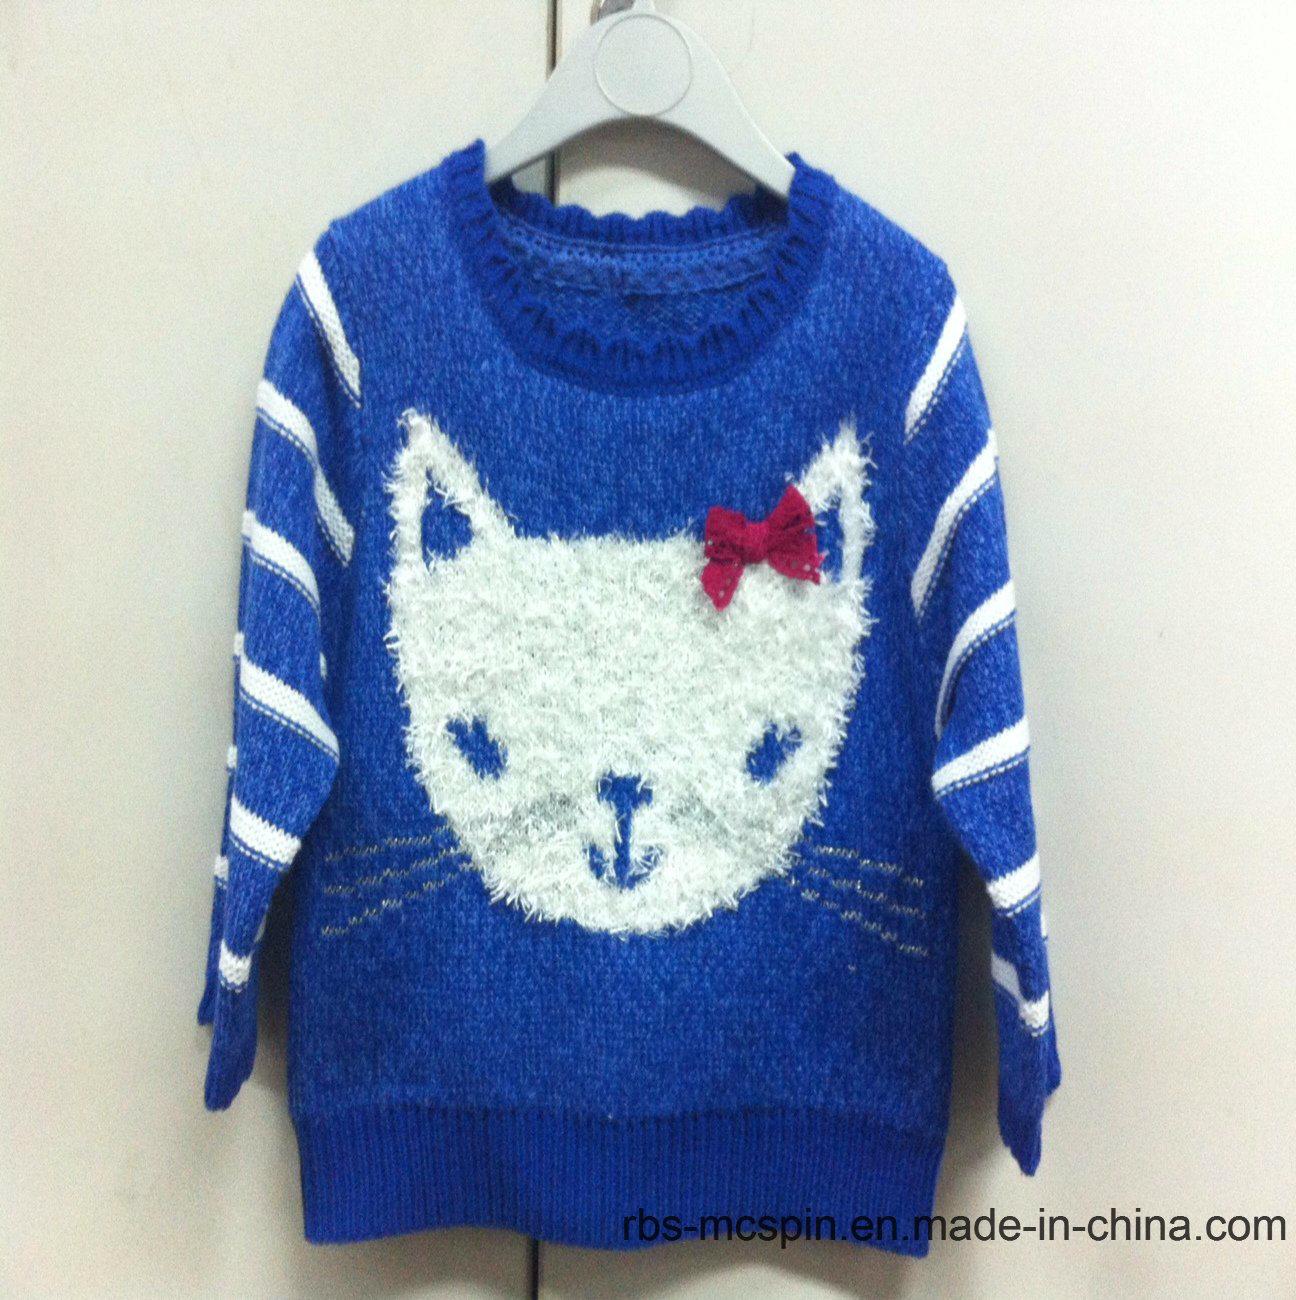 Boys Penguin Acrylic Jumper - Xmas True Kids Knitted Sweater